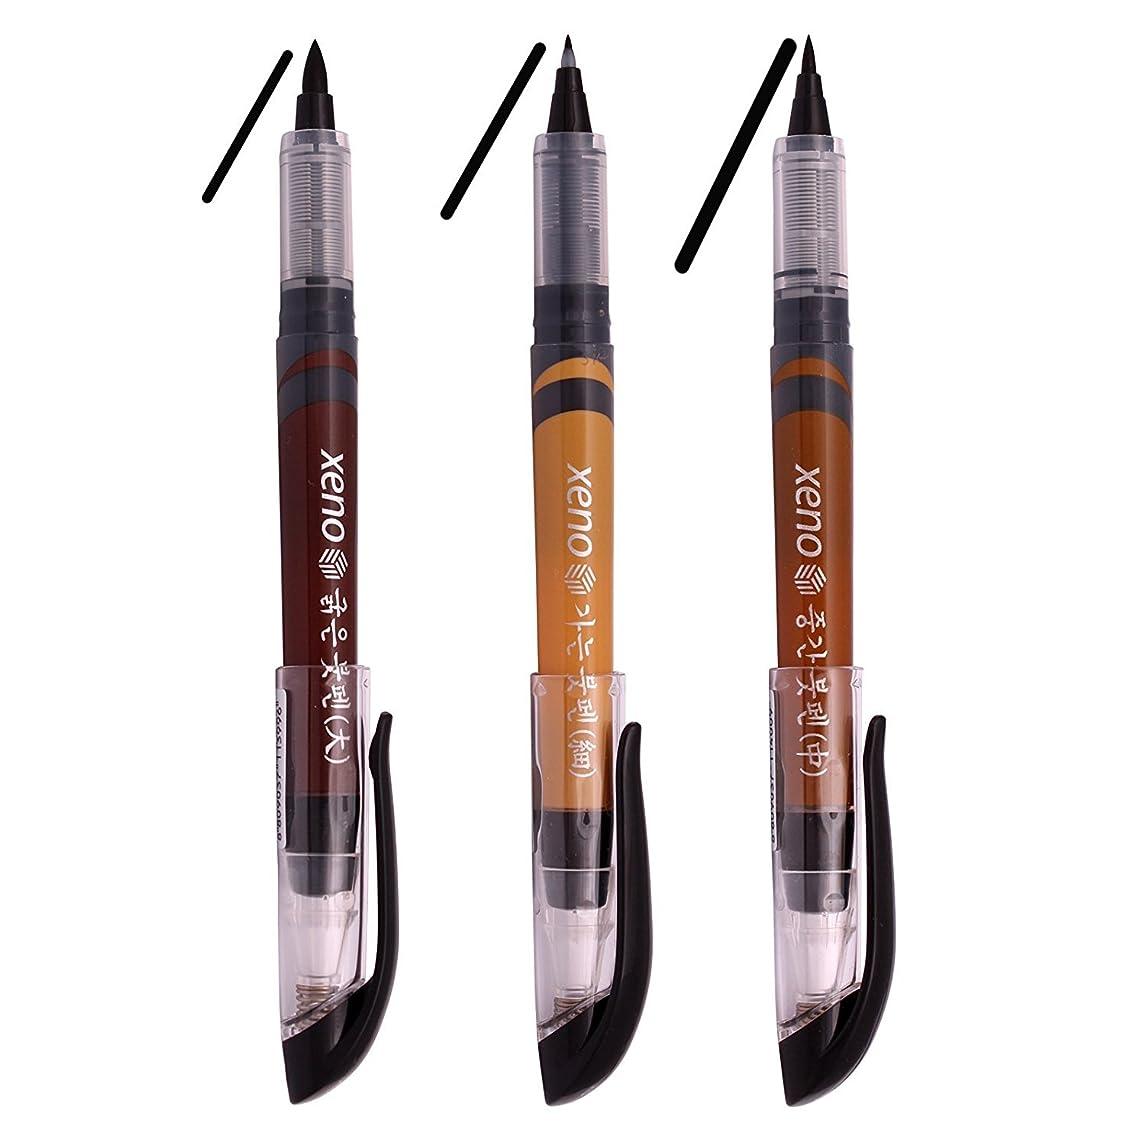 Xeno Calligraphy Brush Pen, Fude pen, Narrow Tip, Kanji China Japan (Fine,Medium,Bold Point)-Black Ink (Pack of 3)